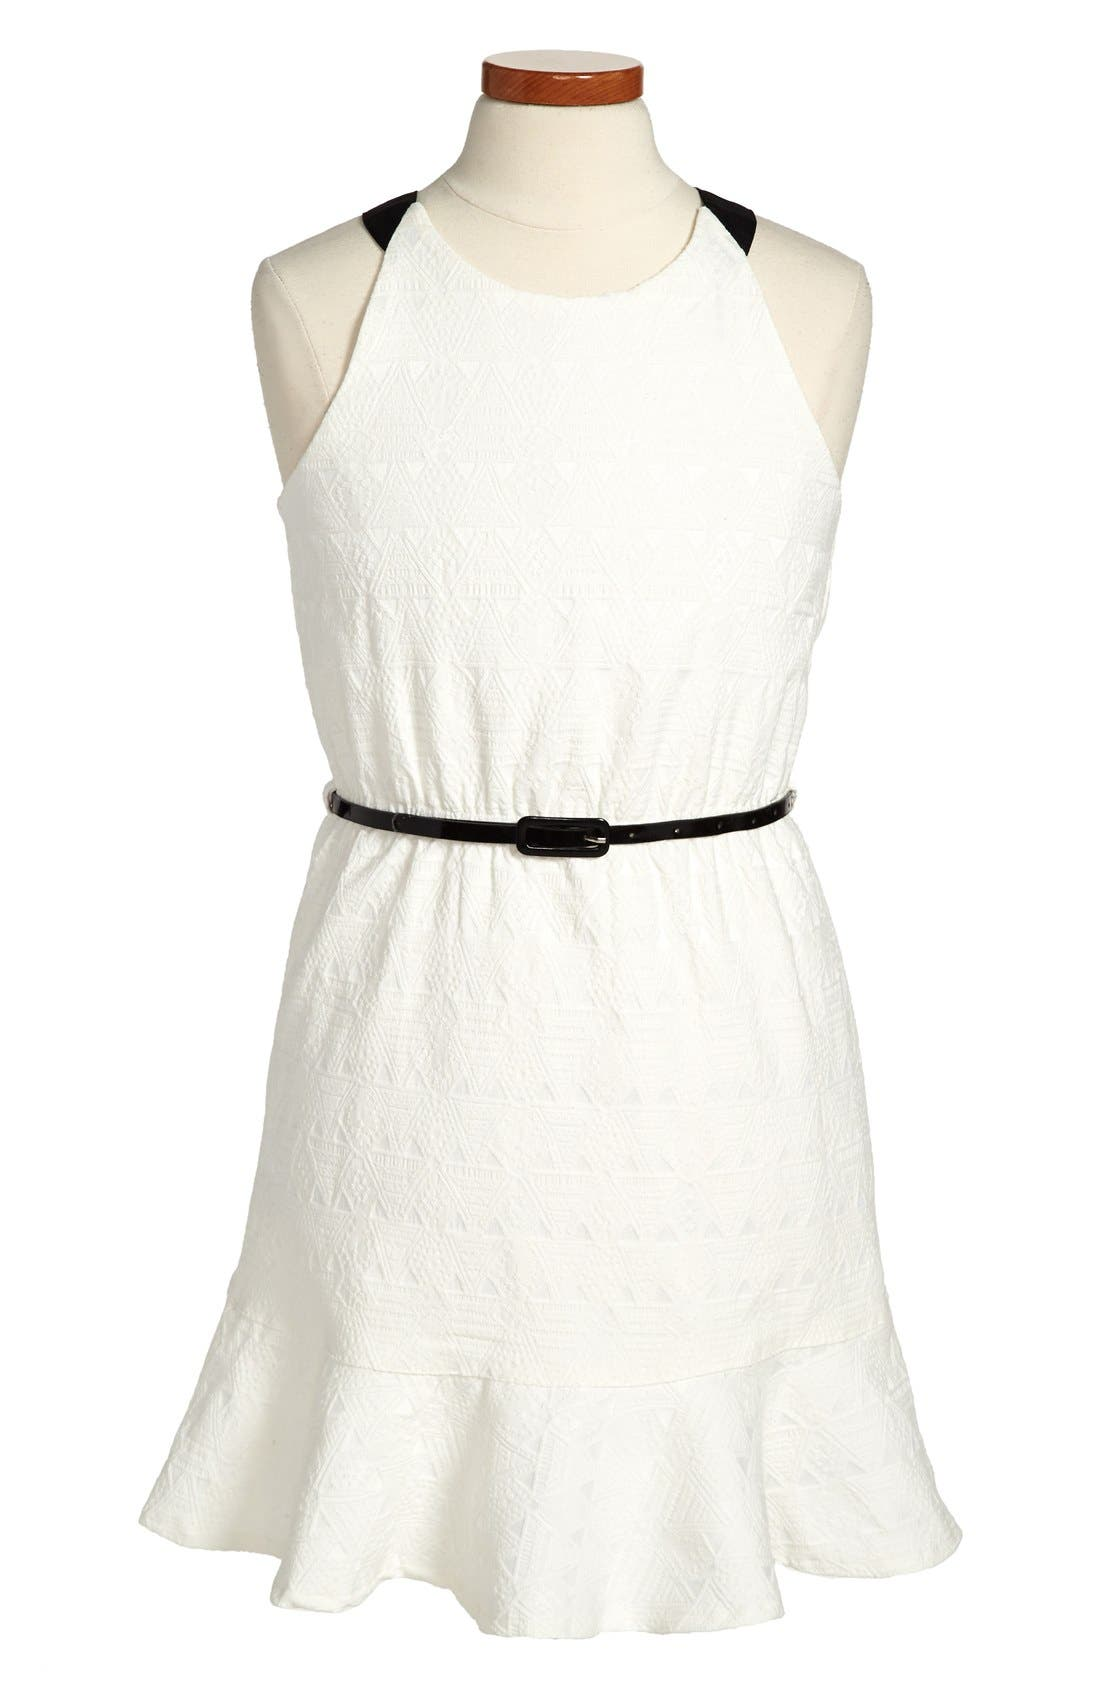 Alternate Image 1 Selected - Nicole Miller Woven Jacquard Dress (Big Girls)